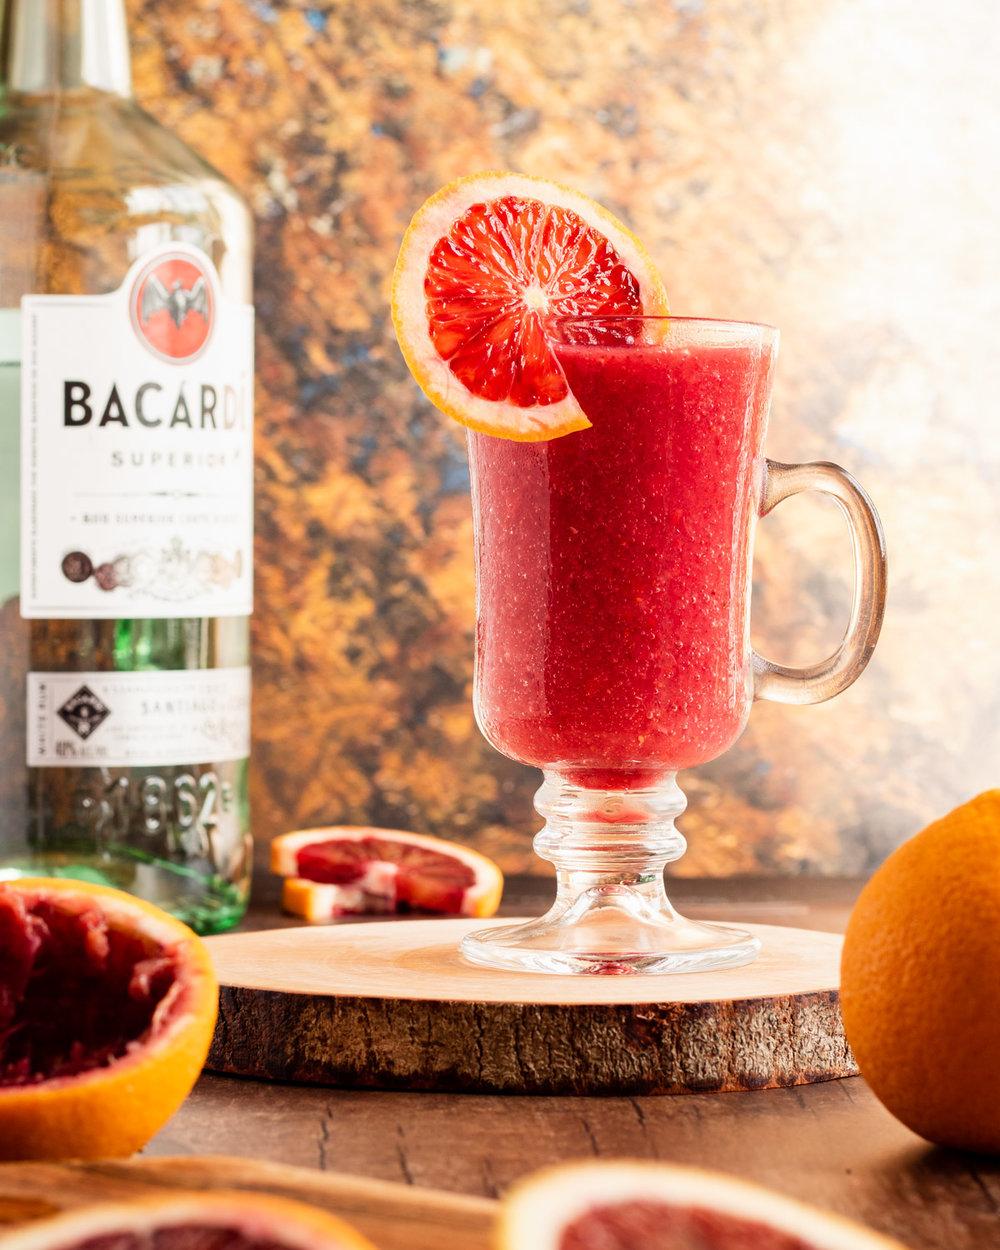 Blood Orange Strawberry Daiquiri cocktail recipe